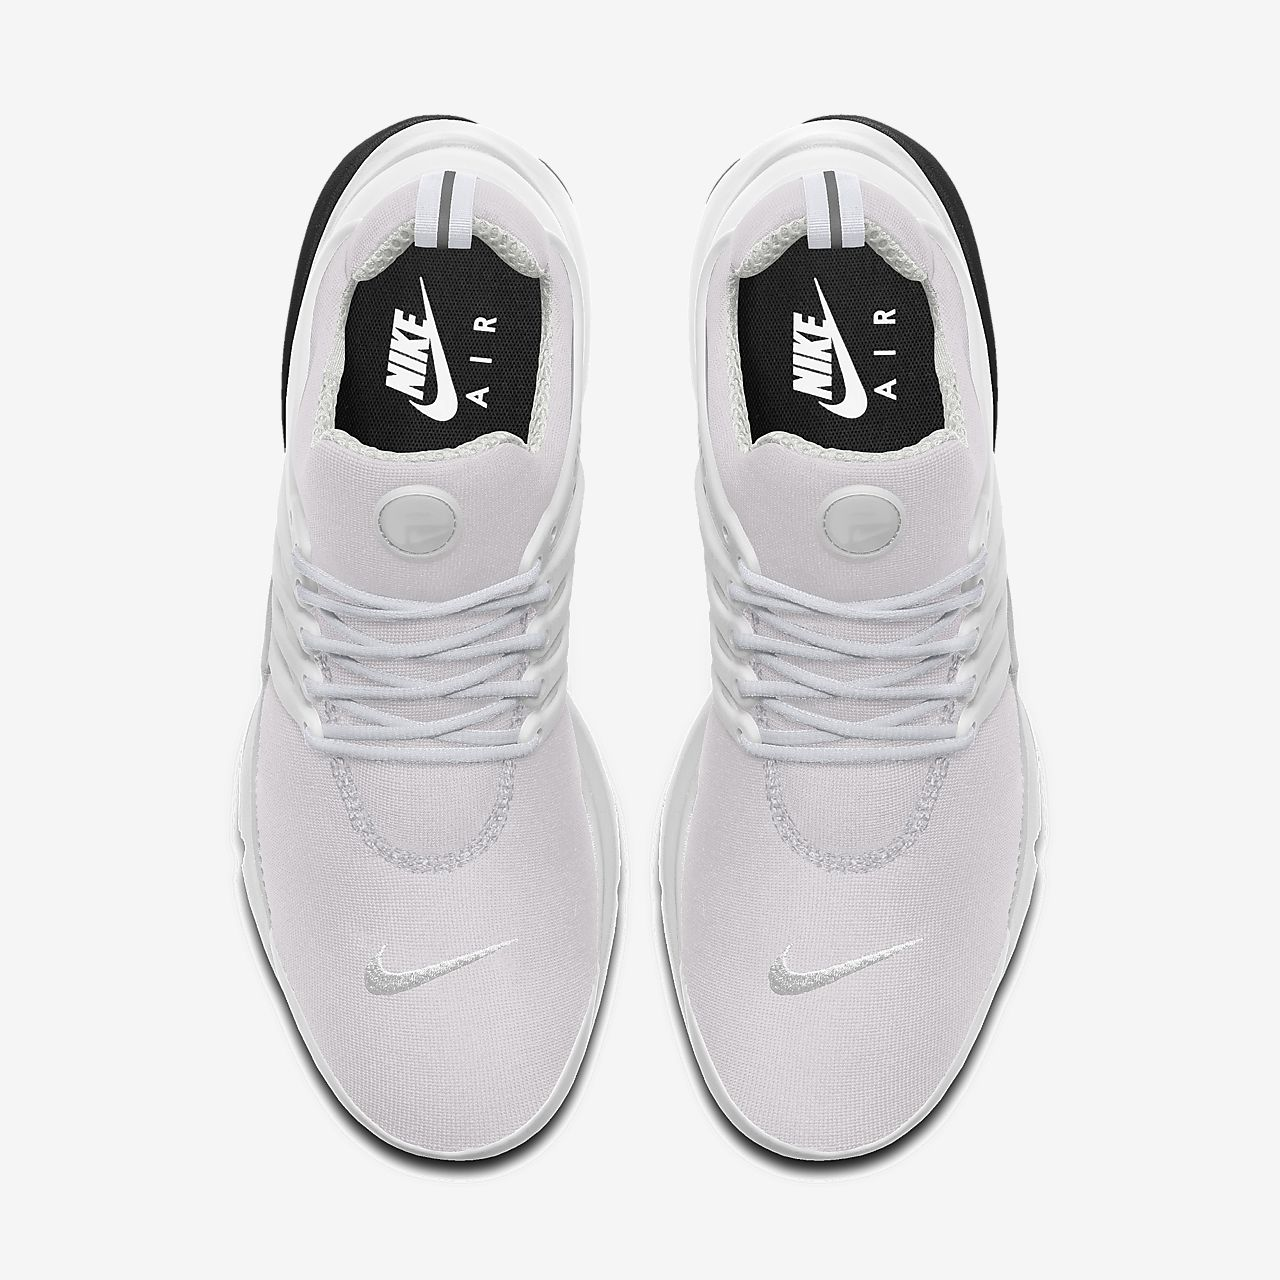 Womens Black & White Nike Air Presto Shoe